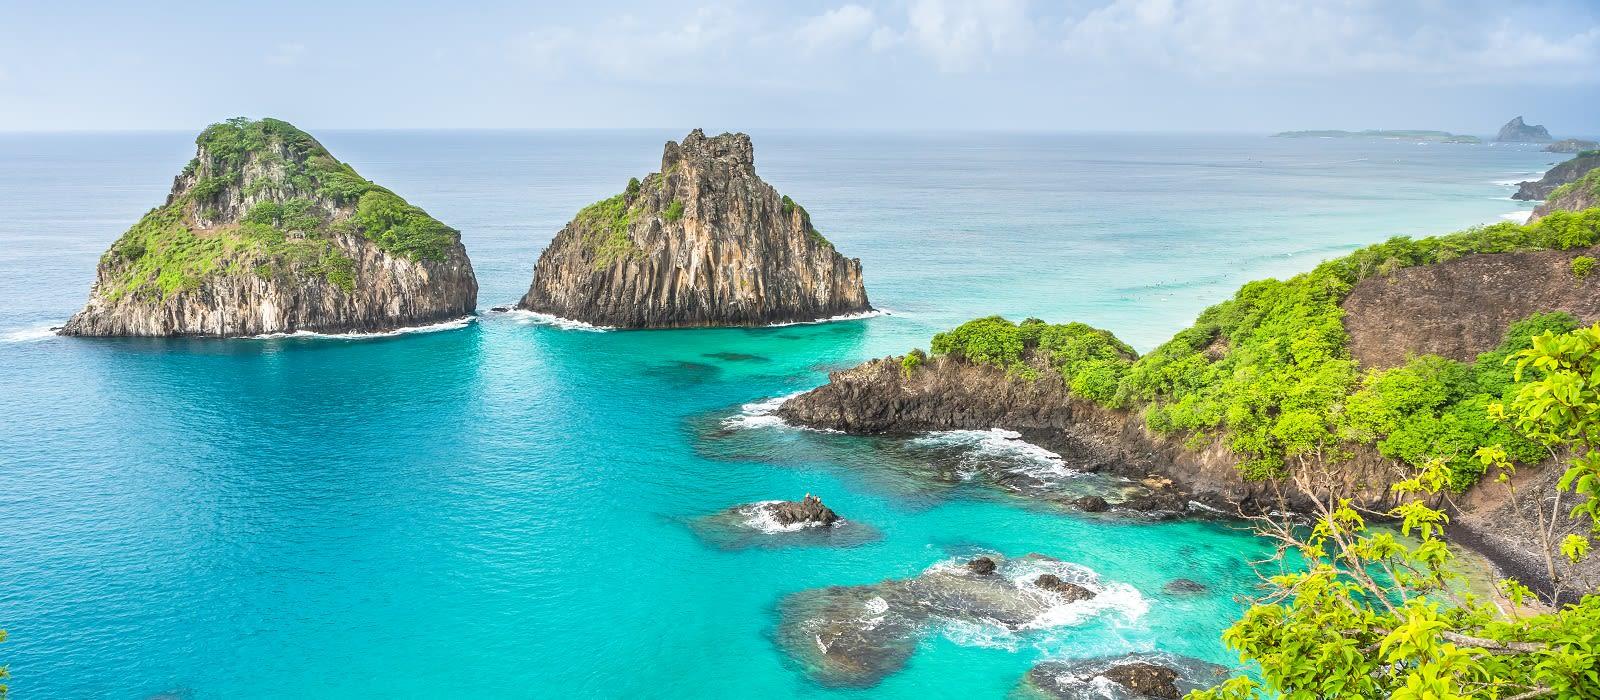 Brasilien: Koloniales Flair & unberührte Inseln Urlaub 4